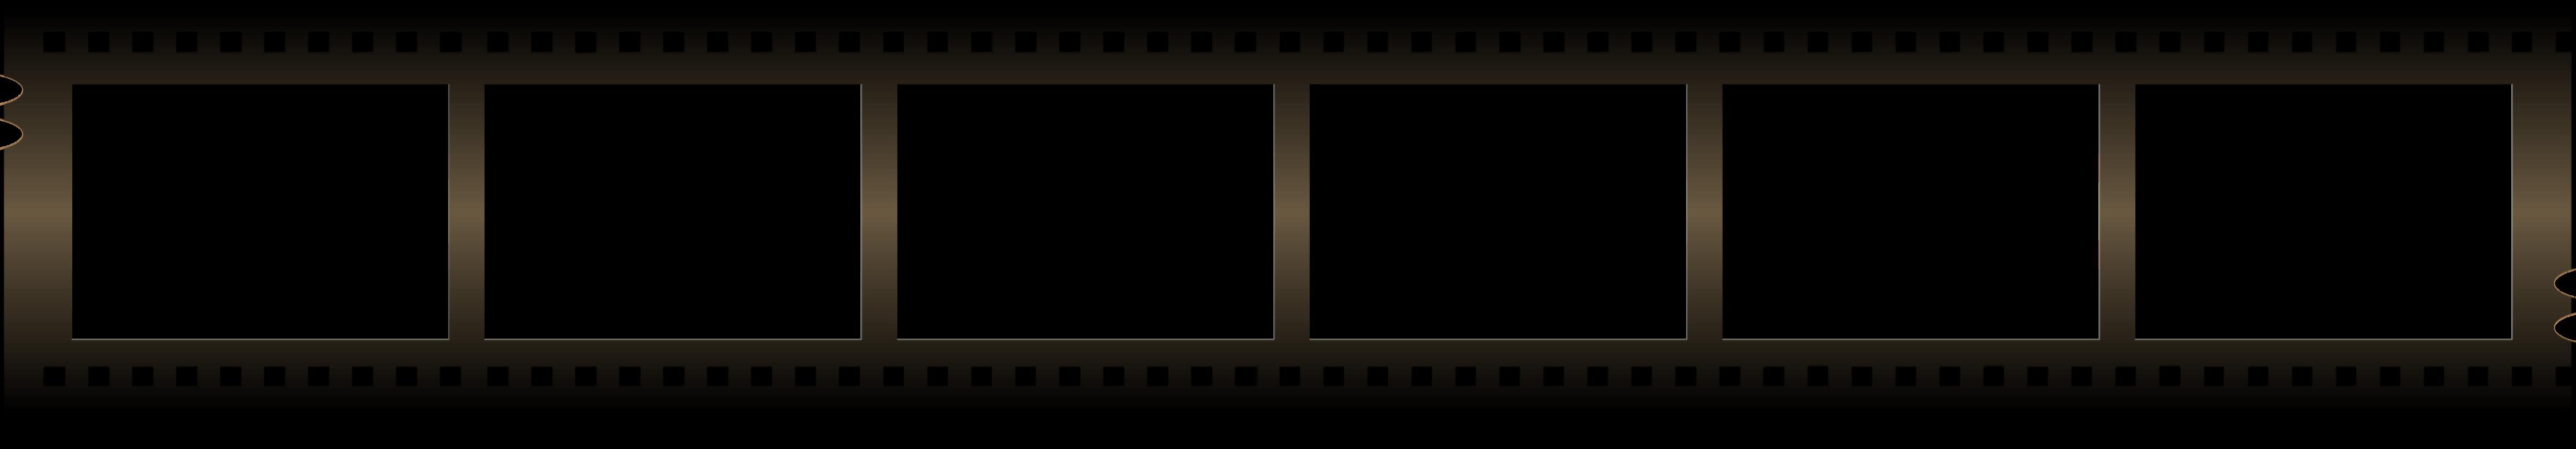 Movie reel gallery for blank film strip clip art image